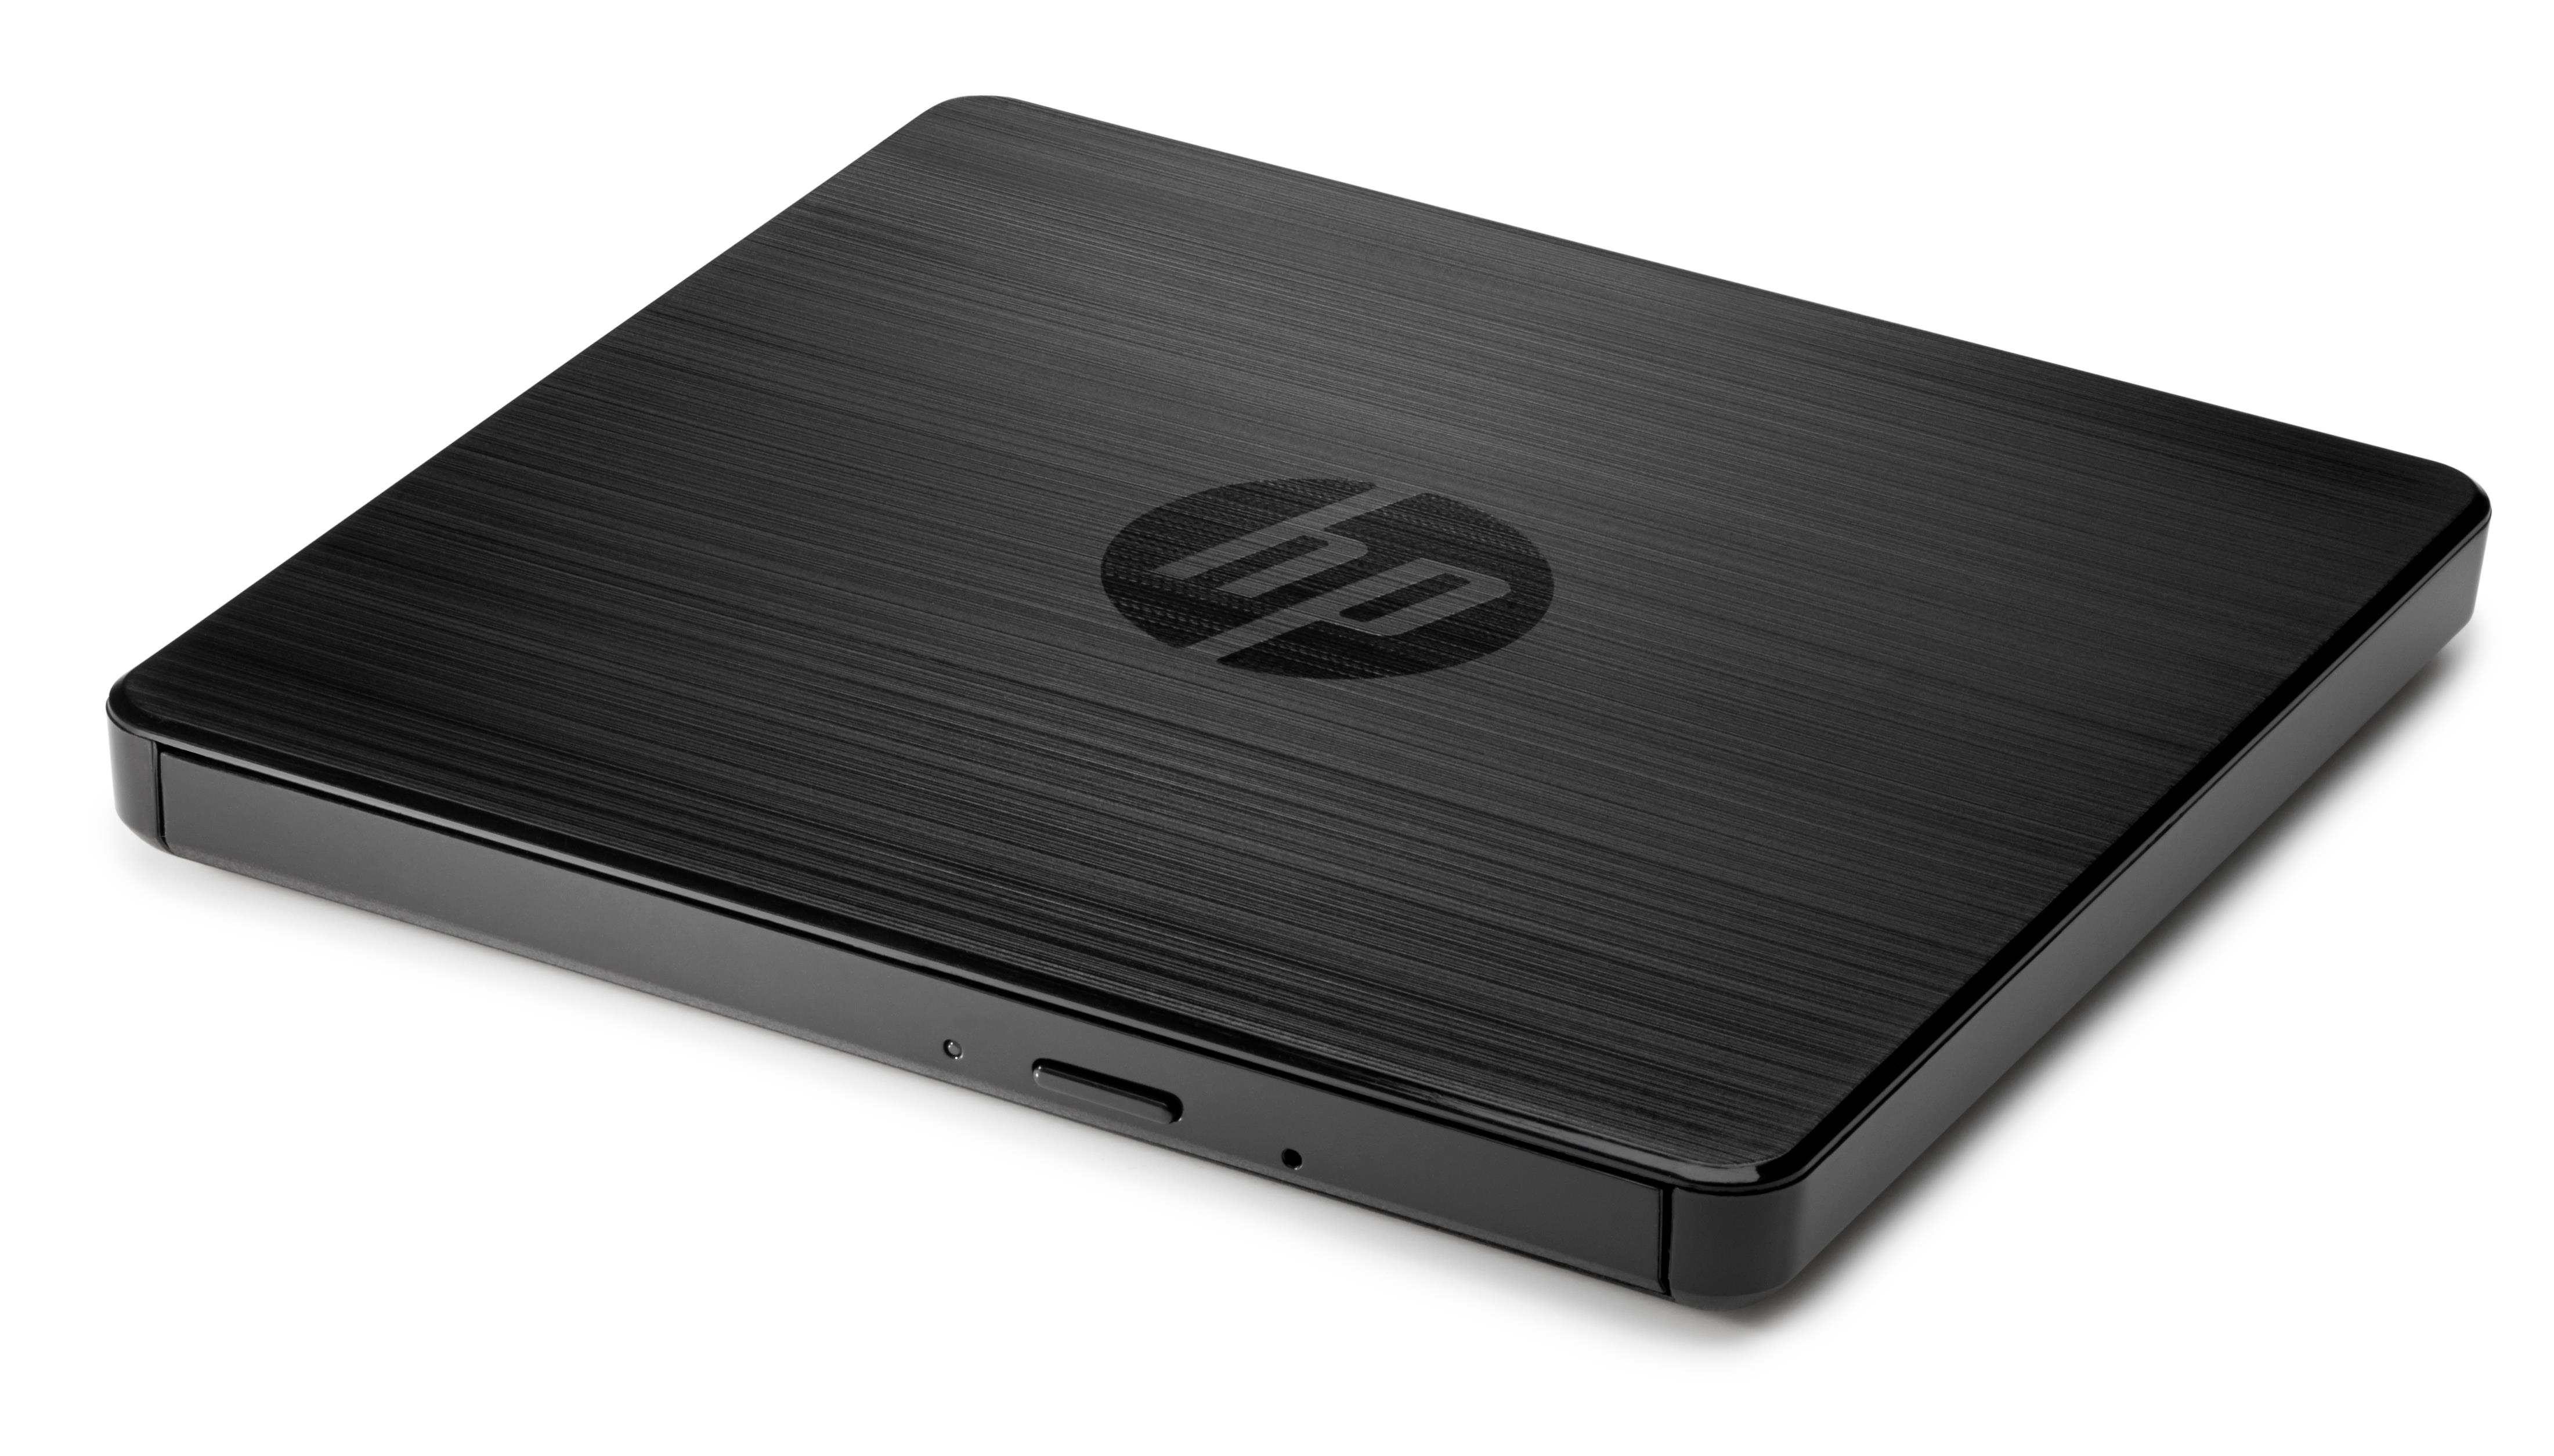 HP USB DVDRW Drive (External)